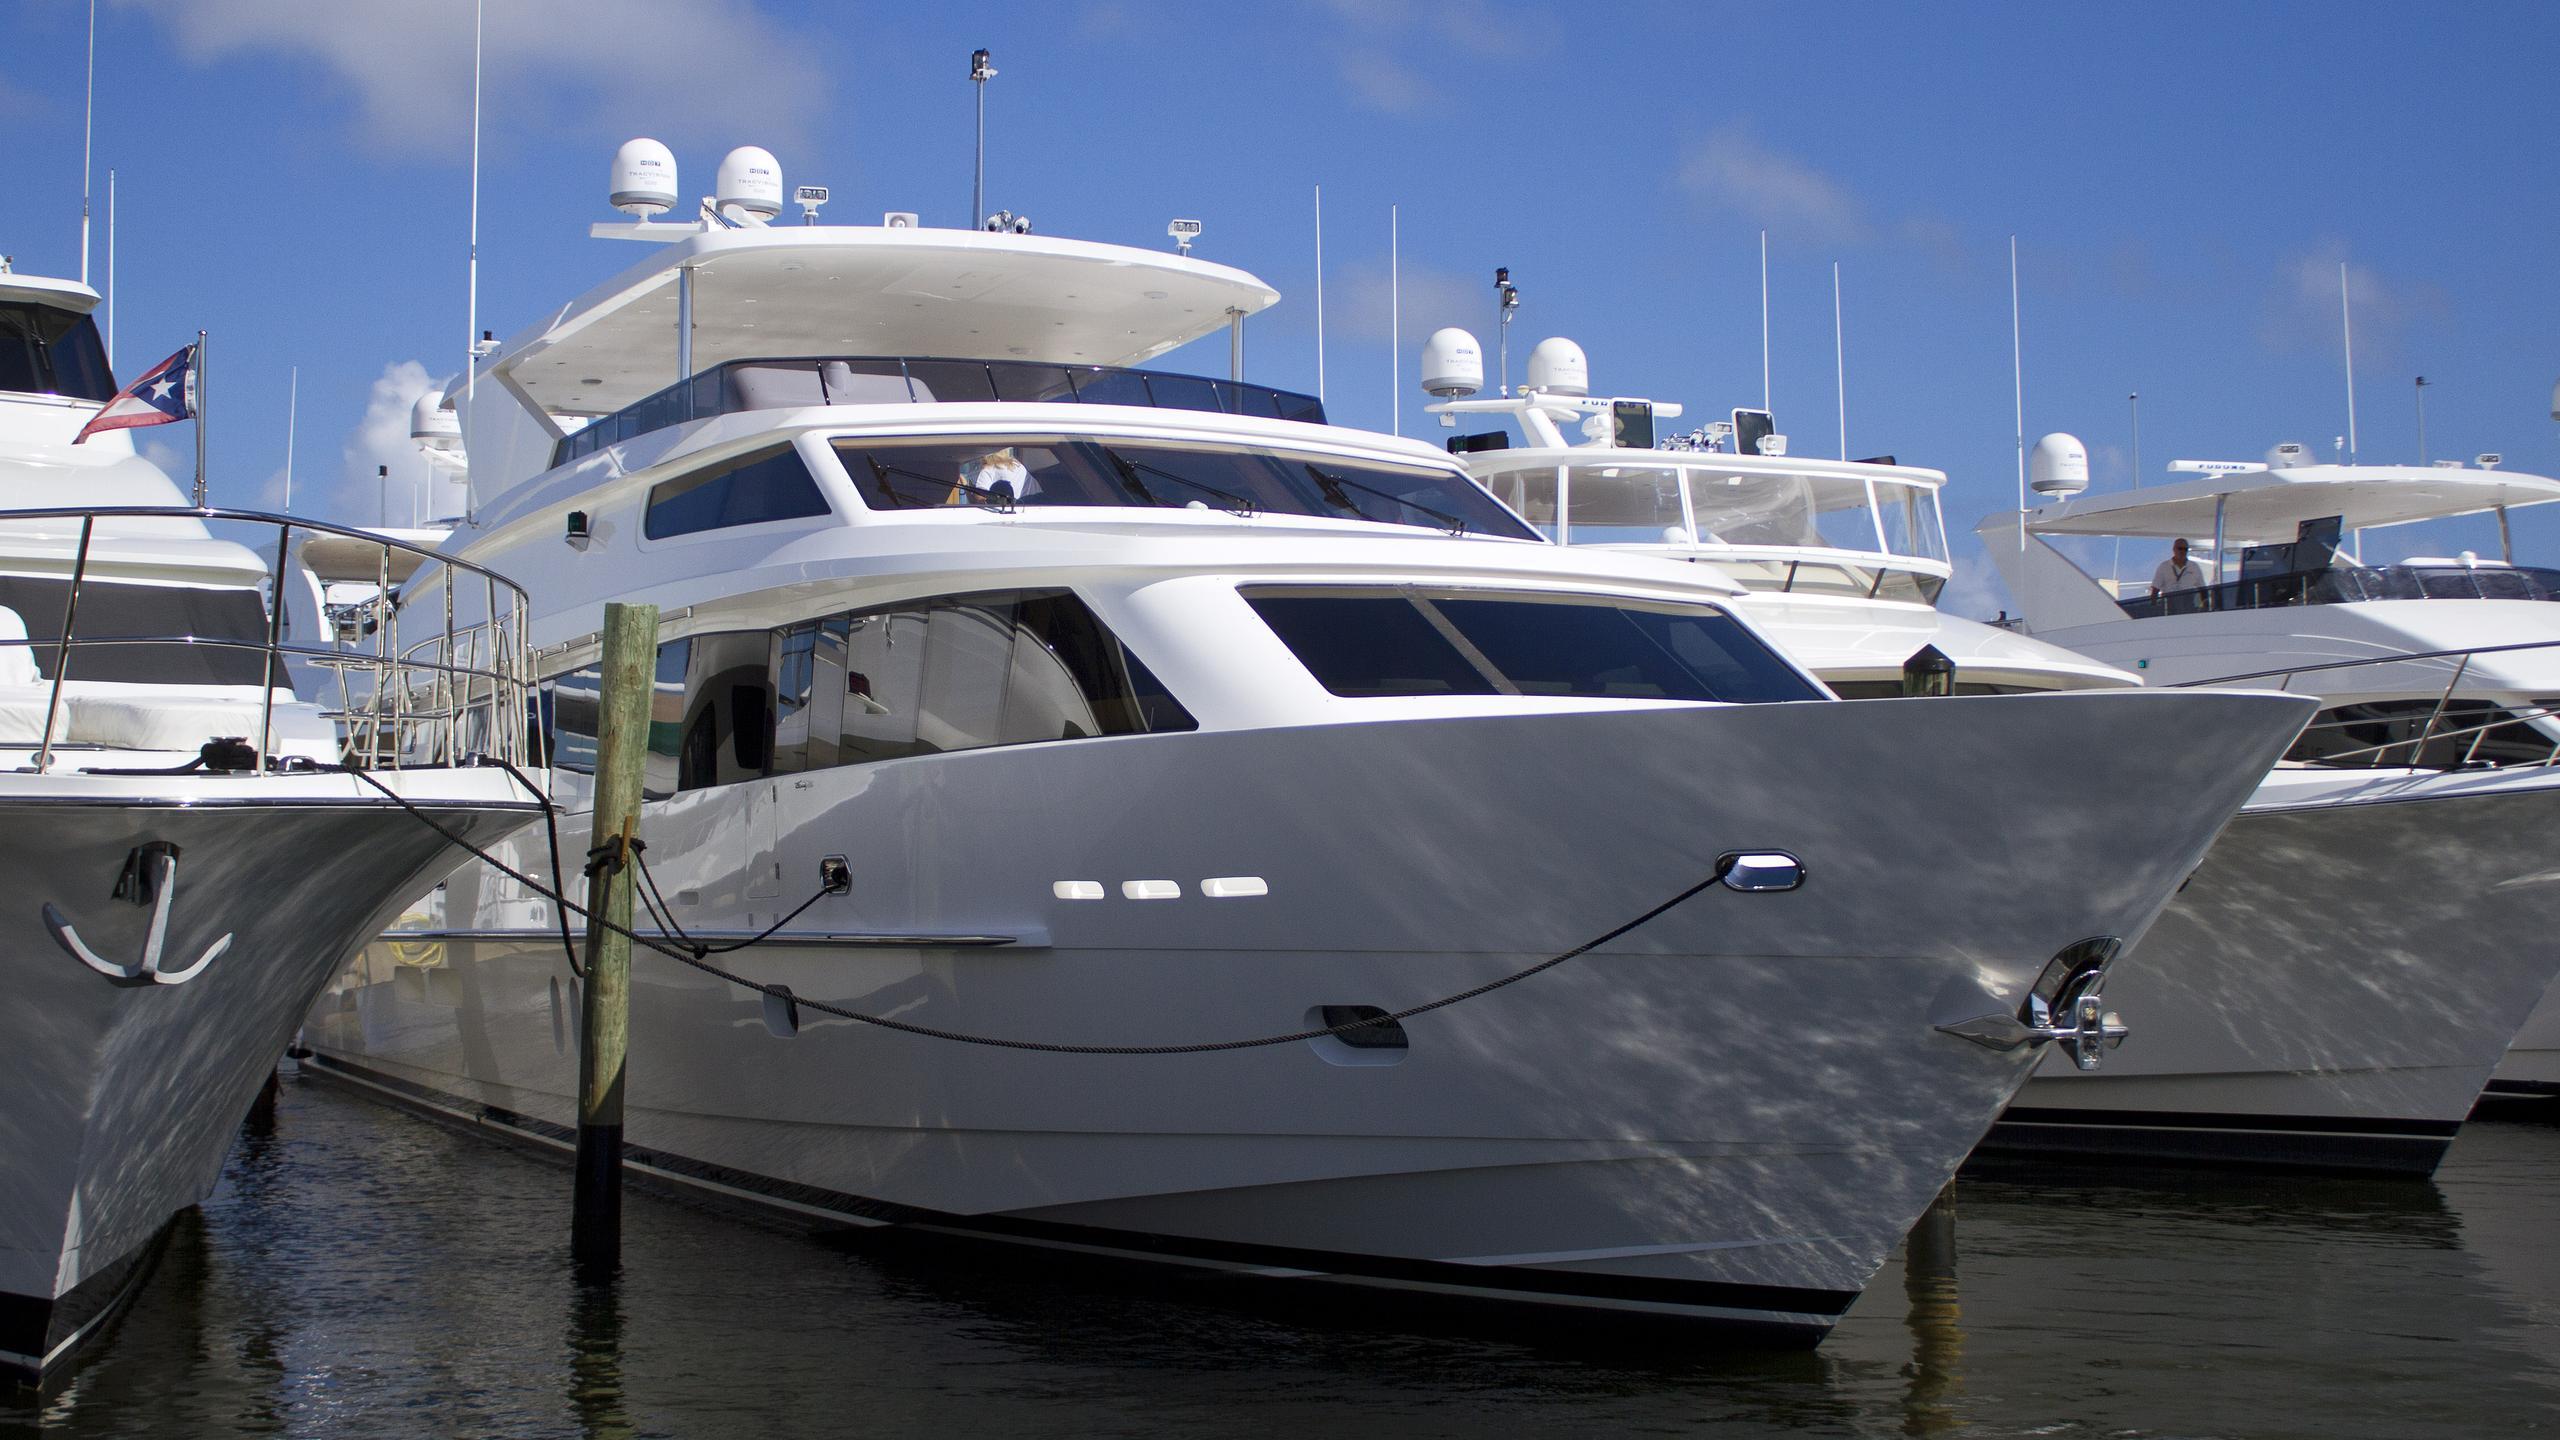 sassy-motoryacht-hargrave-101-2013-31m-bow